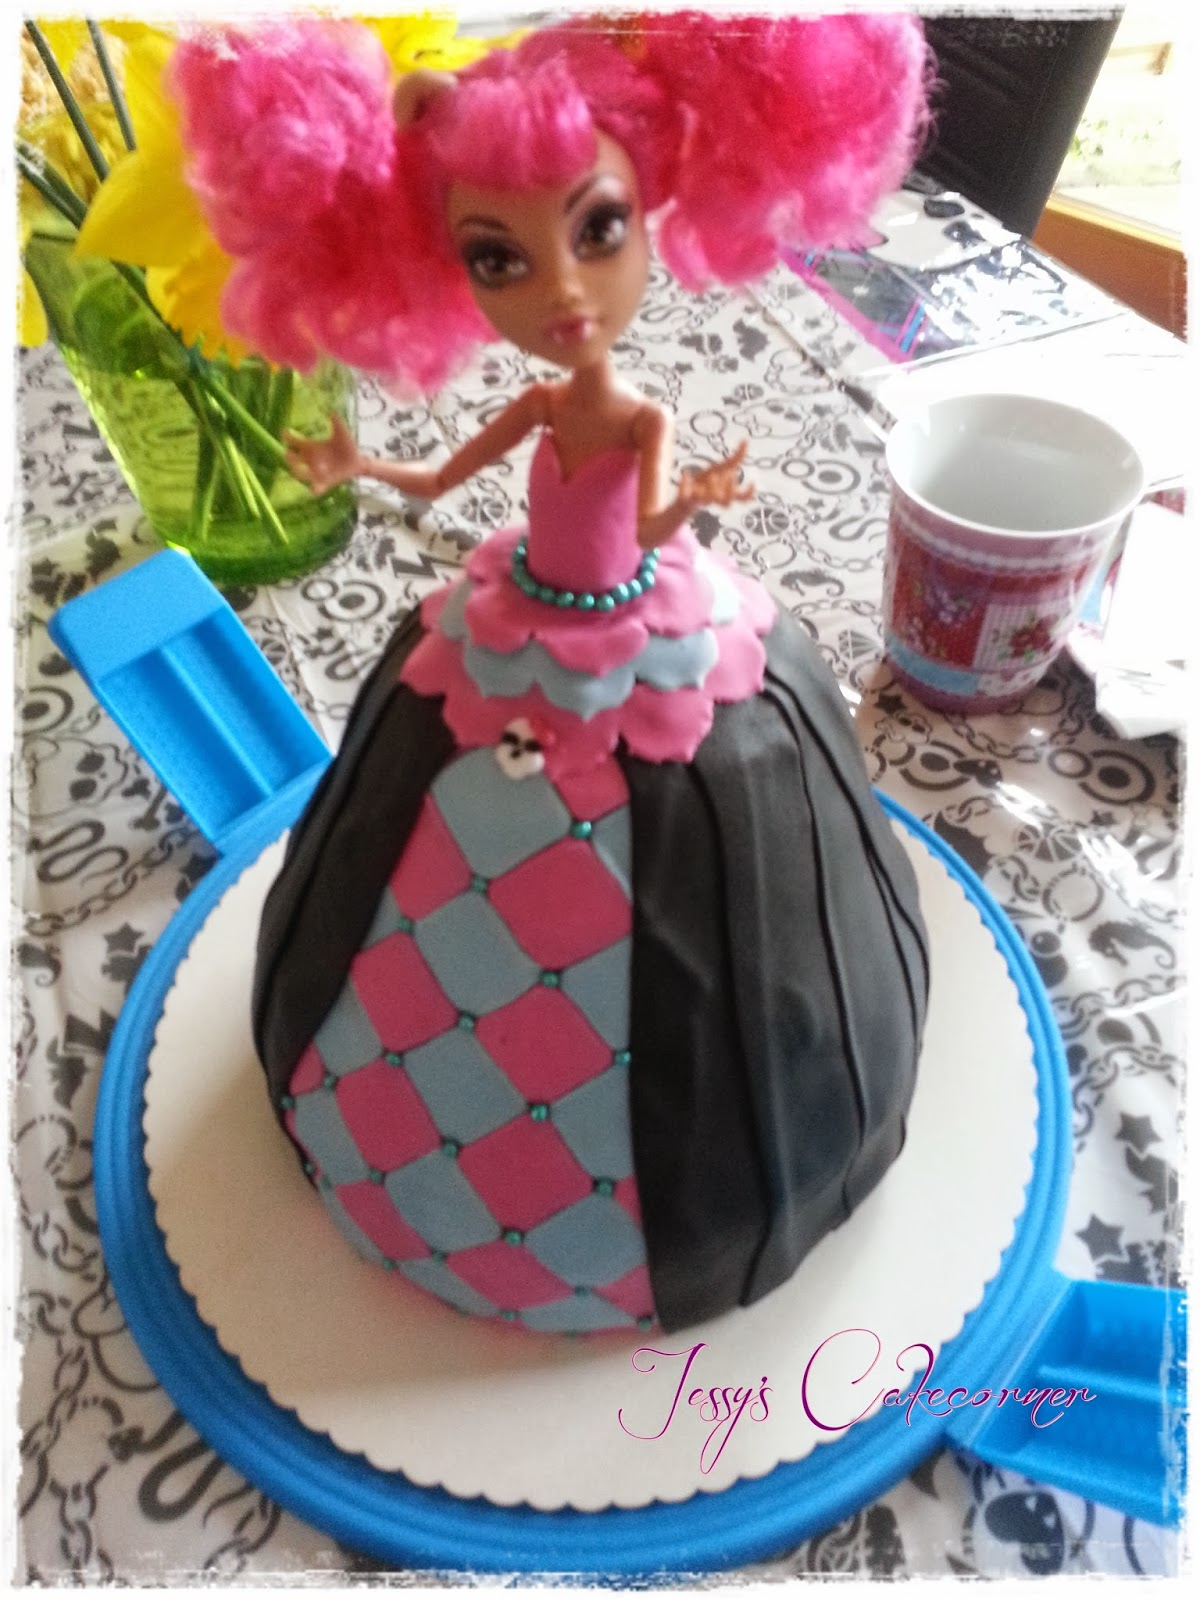 Jessy's doll Barbietorte Monsterhigh cake CakecornerTutorial hQrdoBxsCt